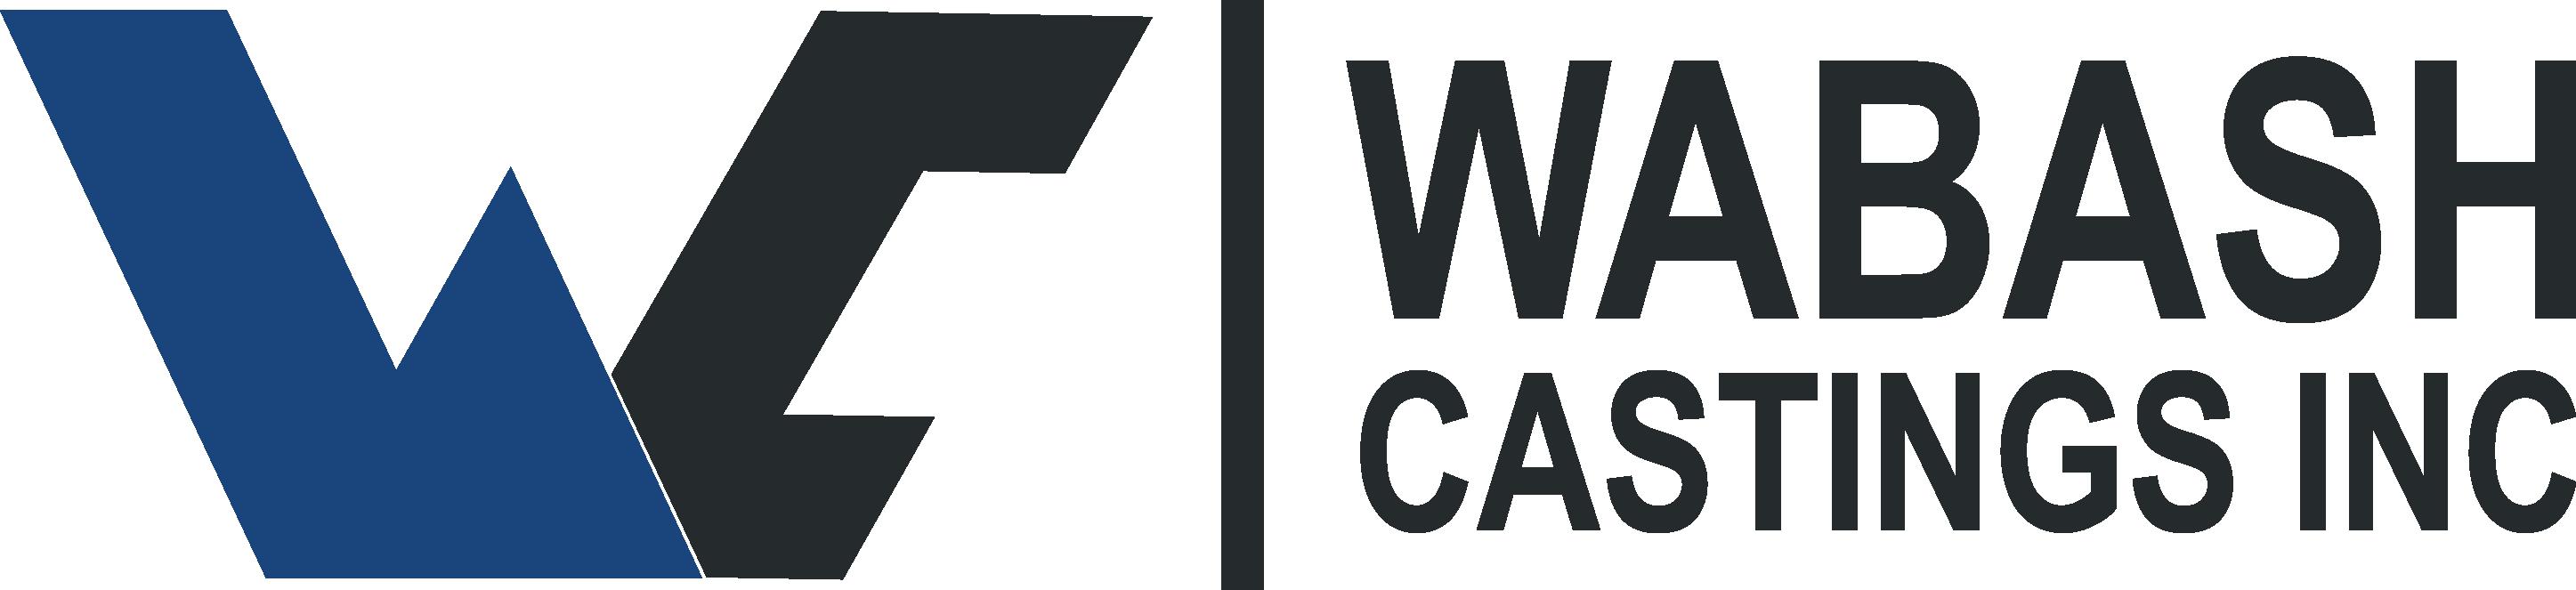 Wabash Castings Inc.